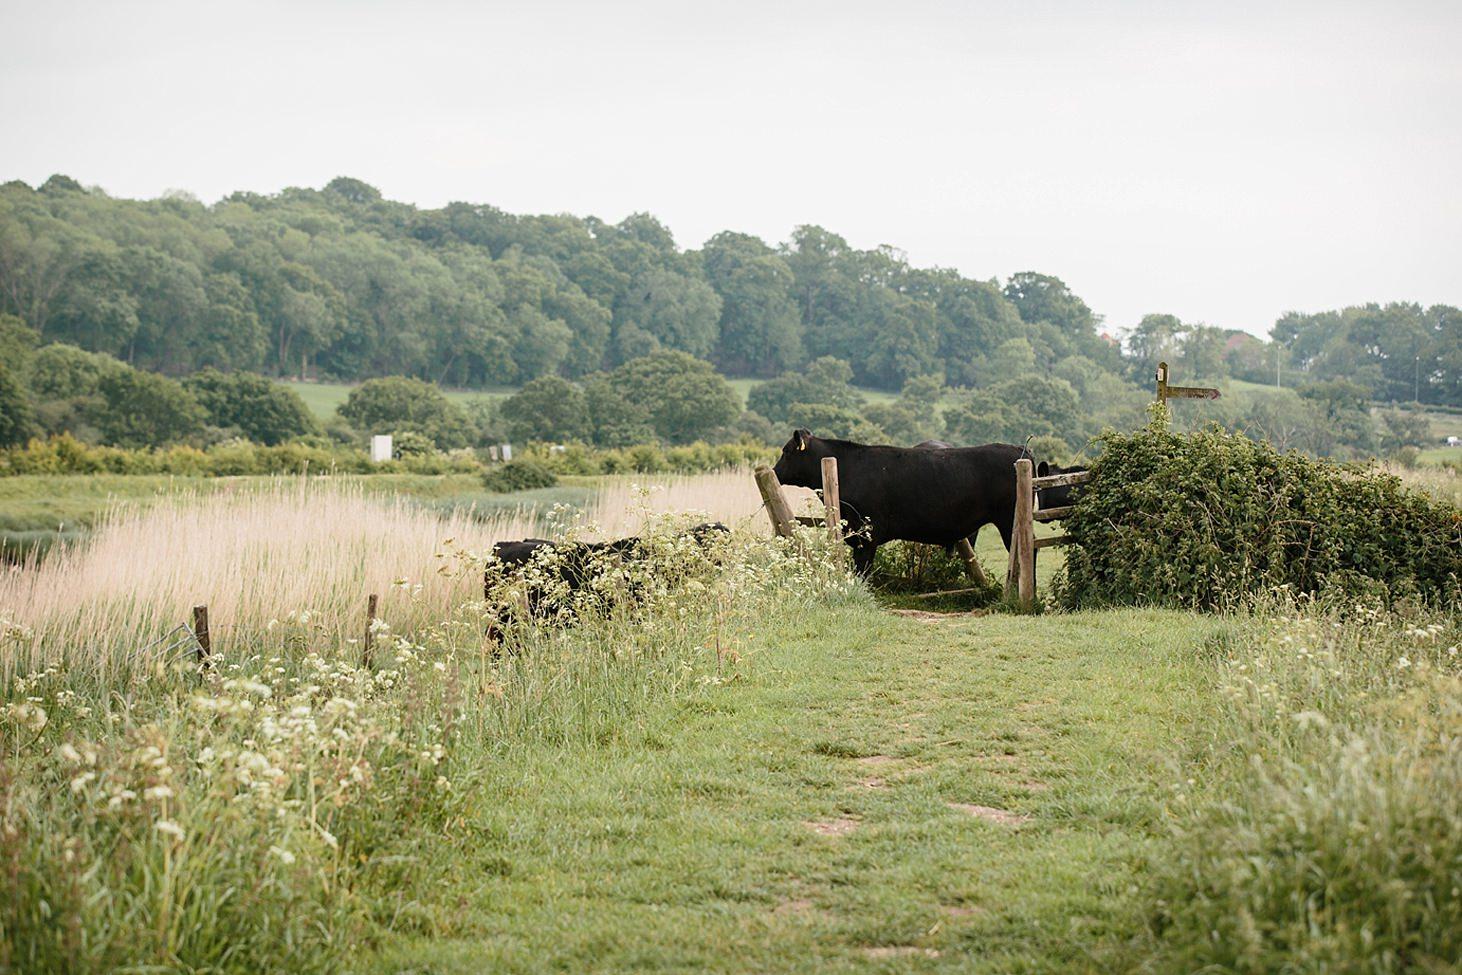 arundel engagement shoot cows